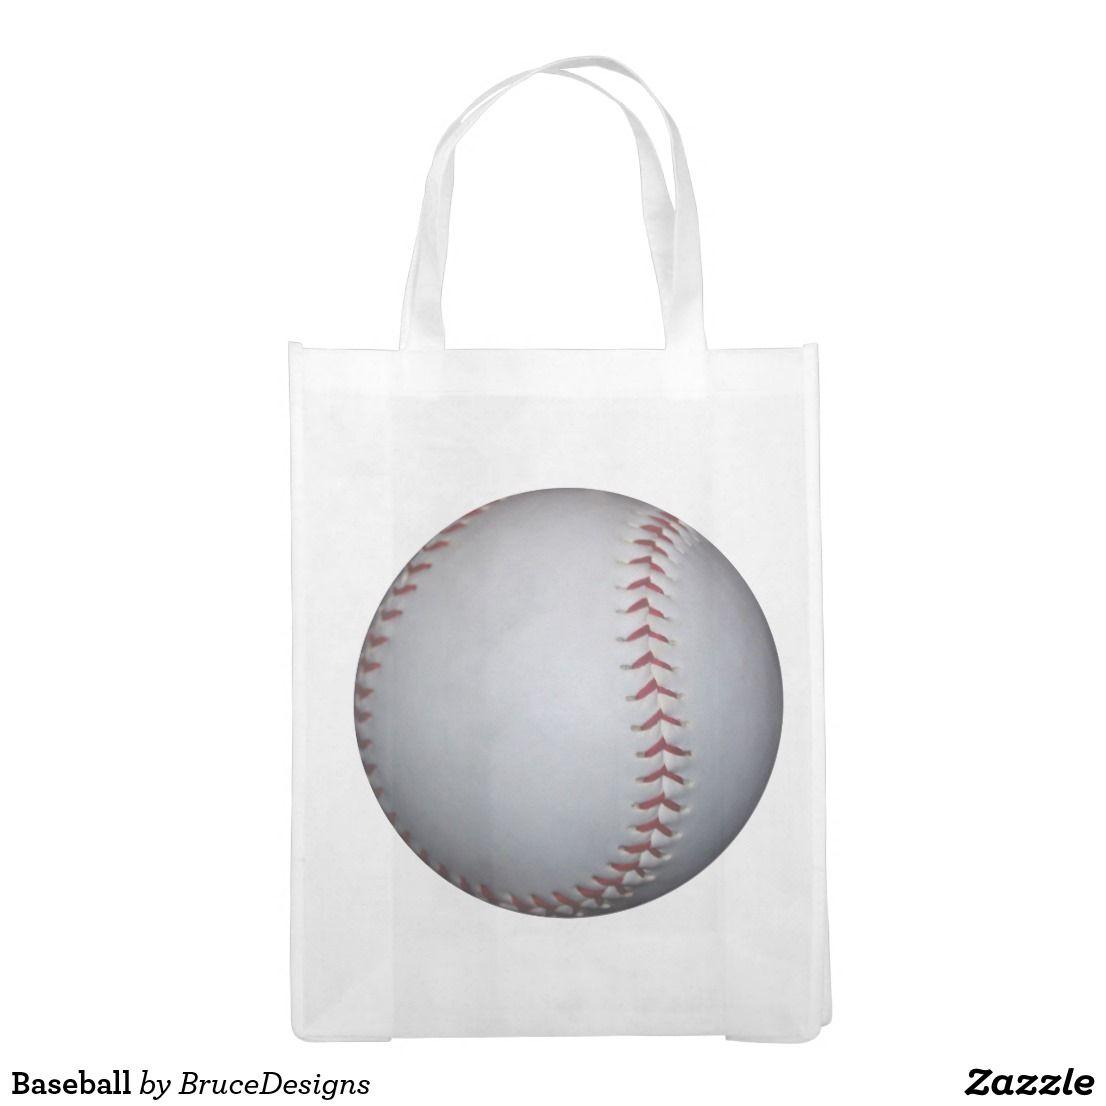 Baseball Reusable Grocery Bag Zazzle Com Reusable Grocery Bags Grocery Bag Bags